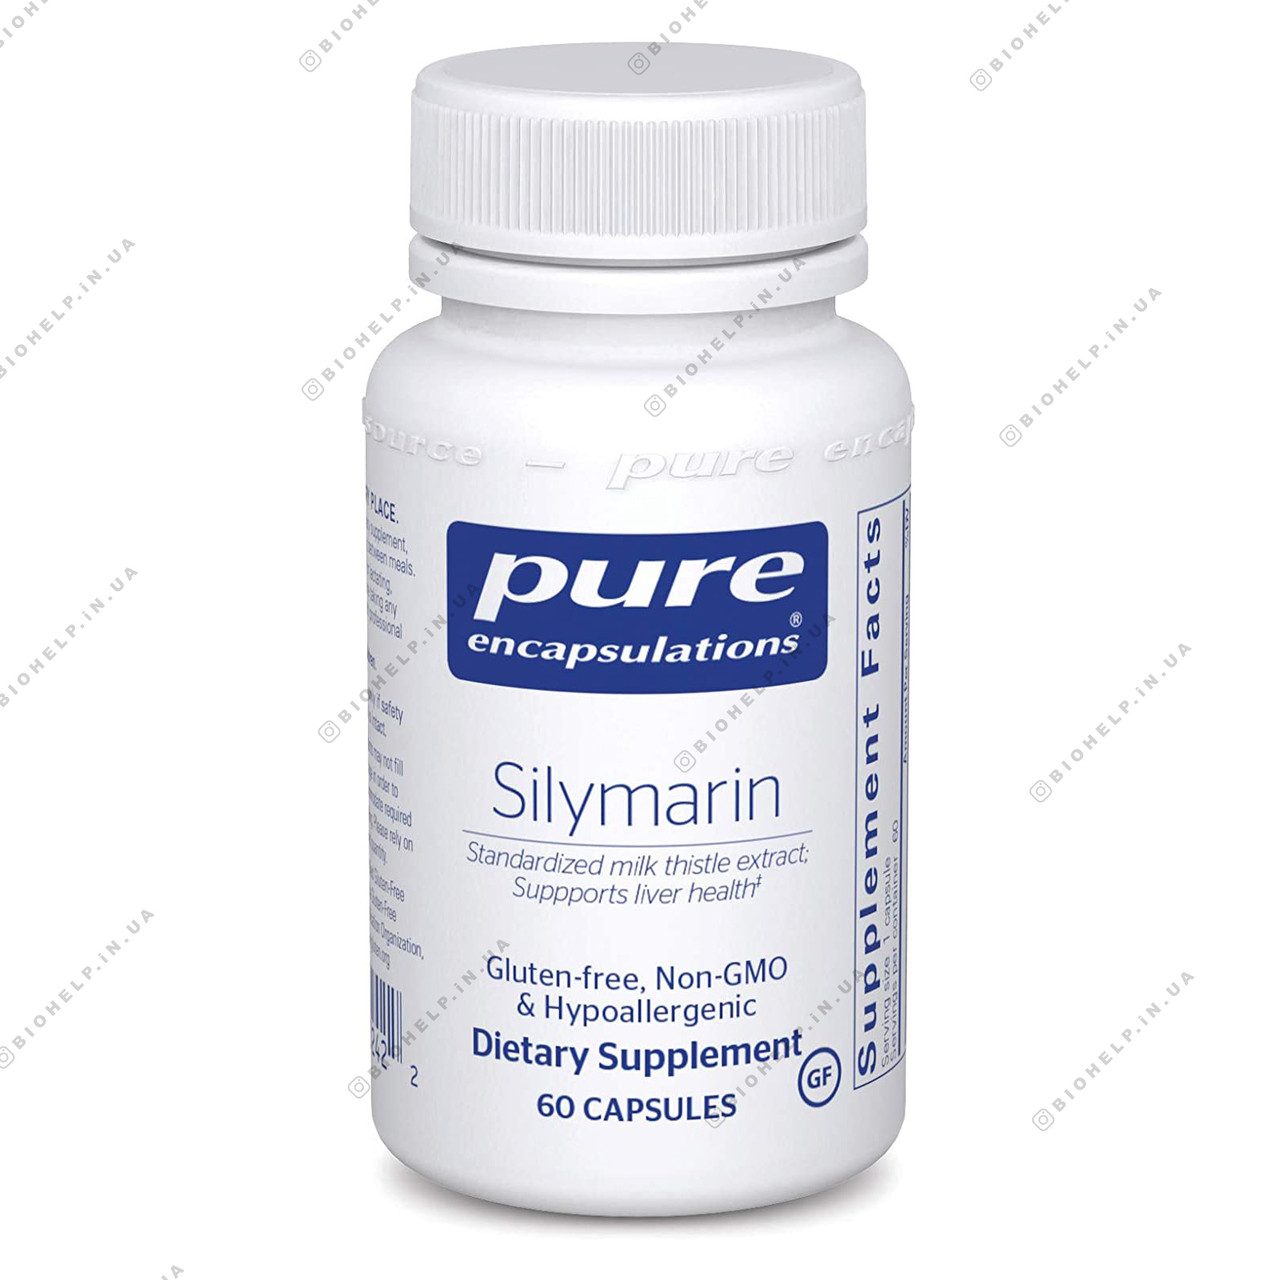 Pure Encapsulations Silymarin 250 mg 120 caps Силимарин 250 мг.